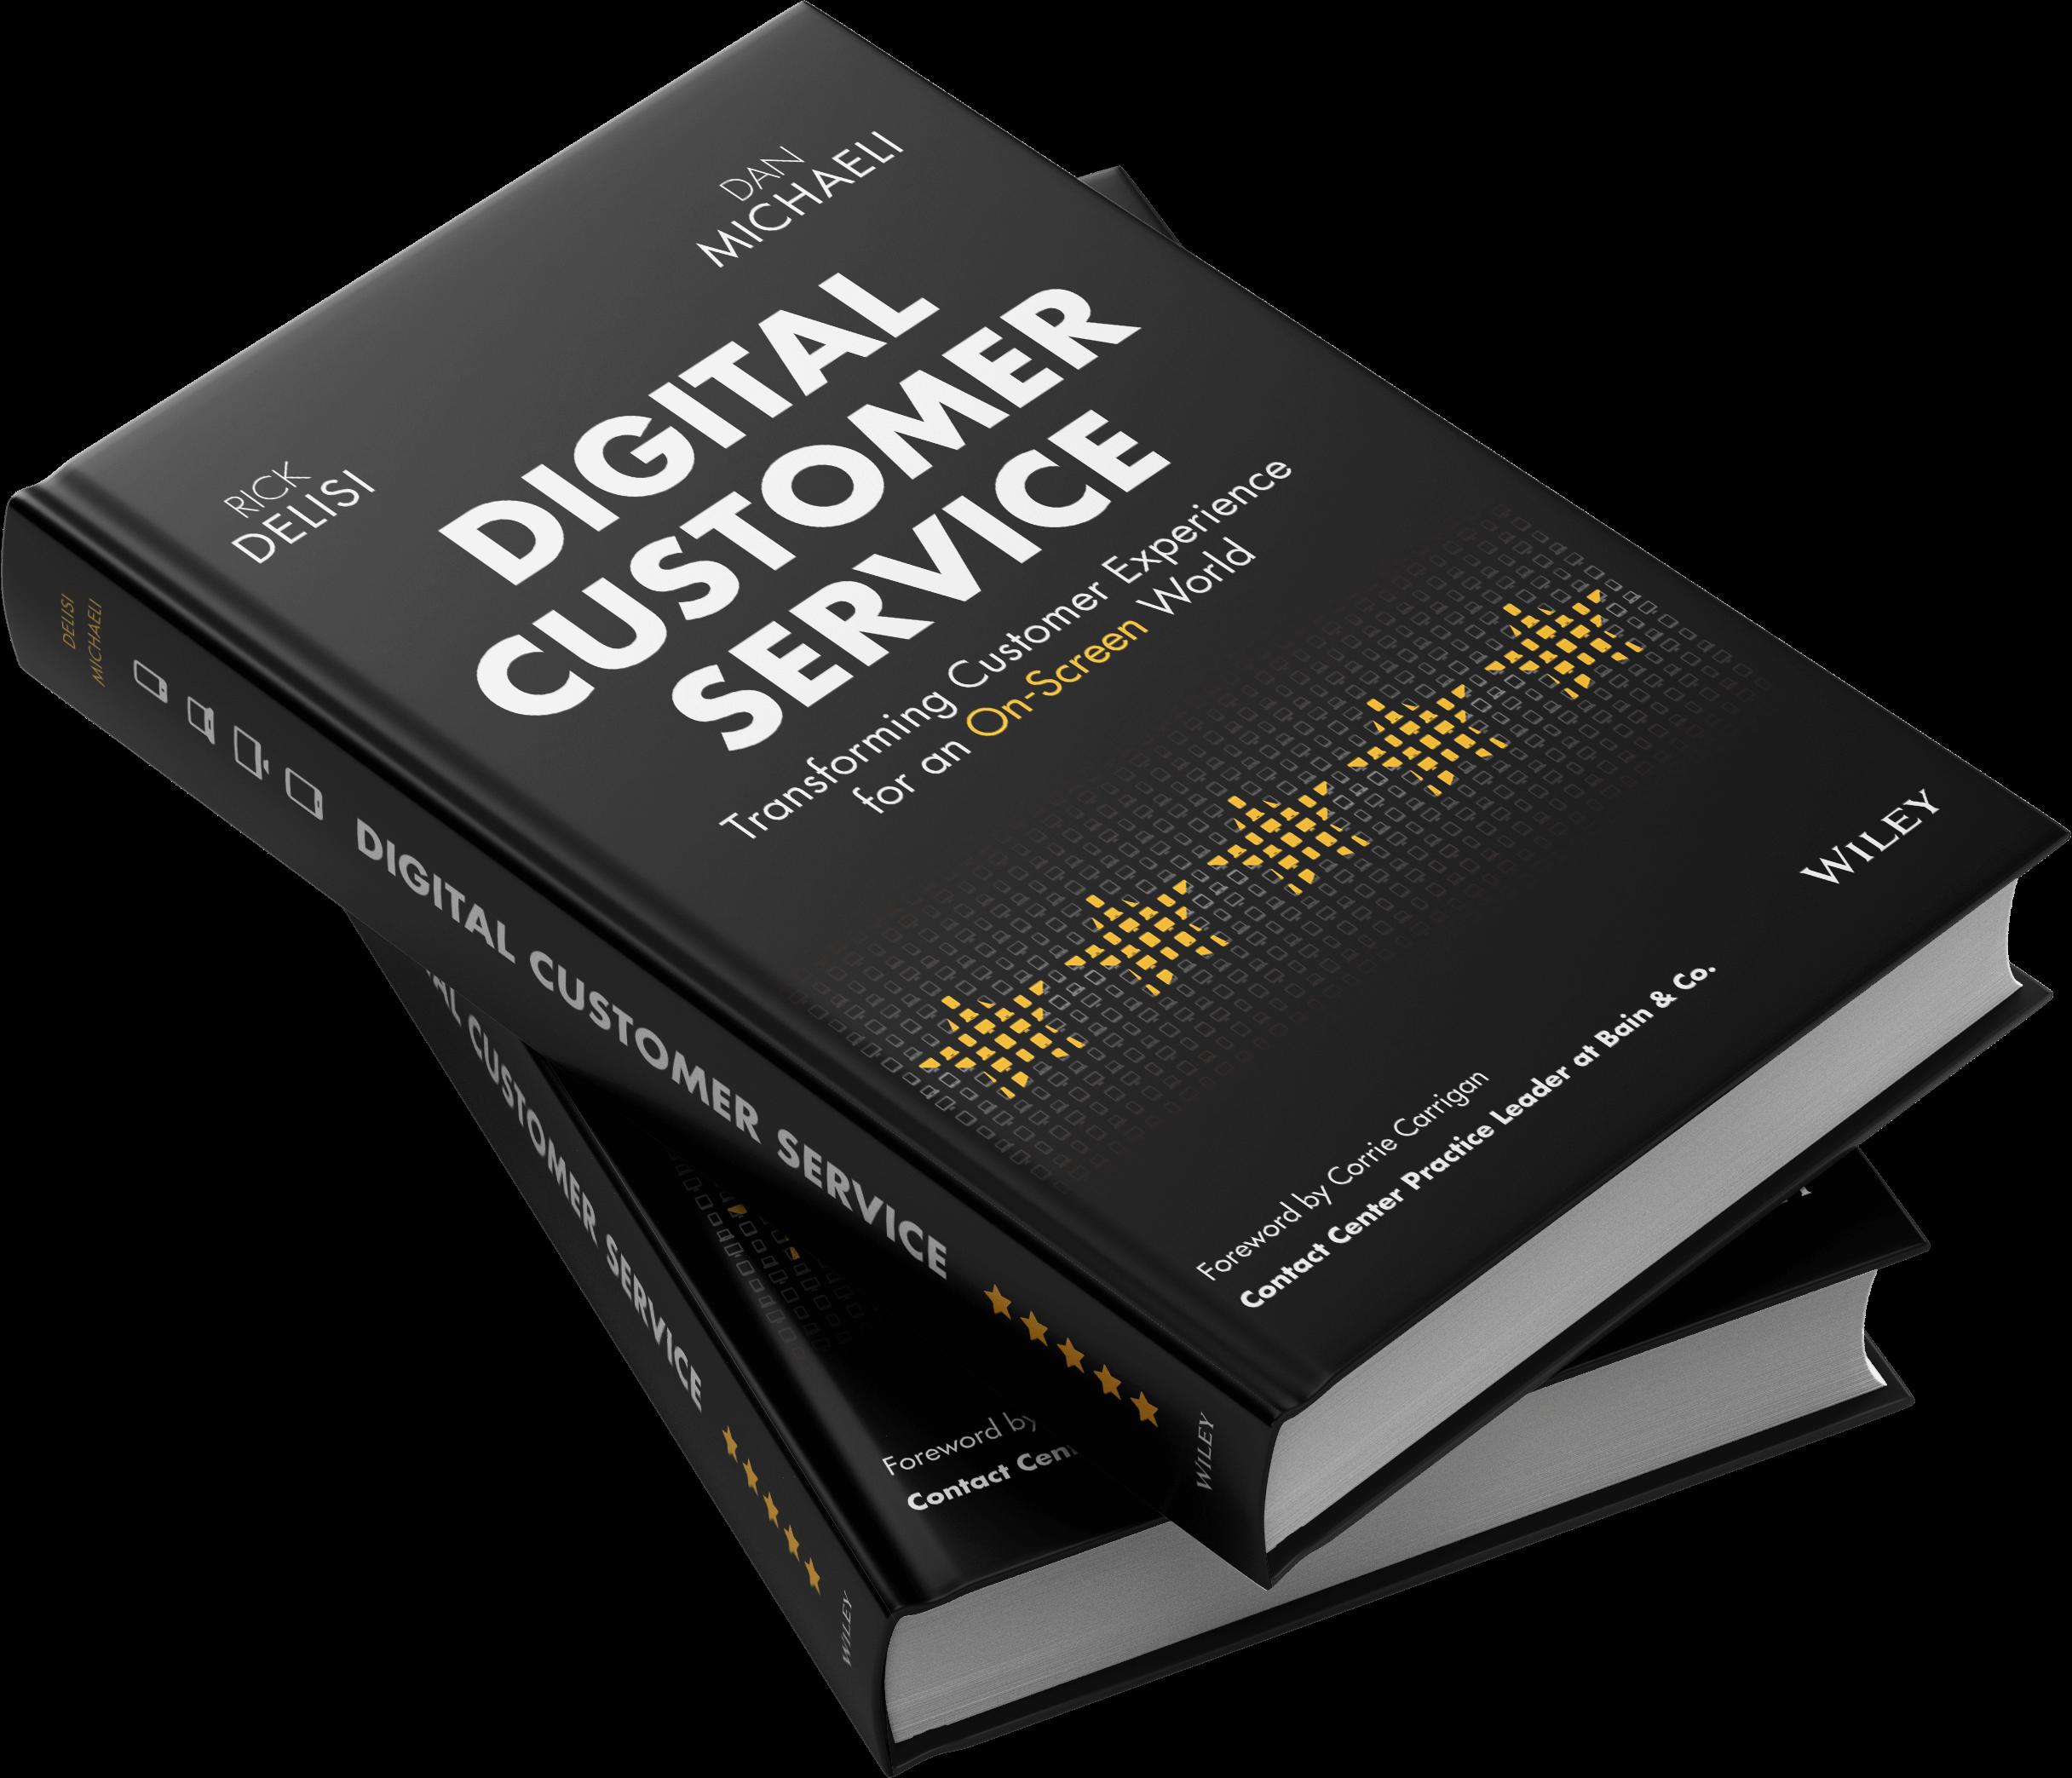 Digital Customer Service Books